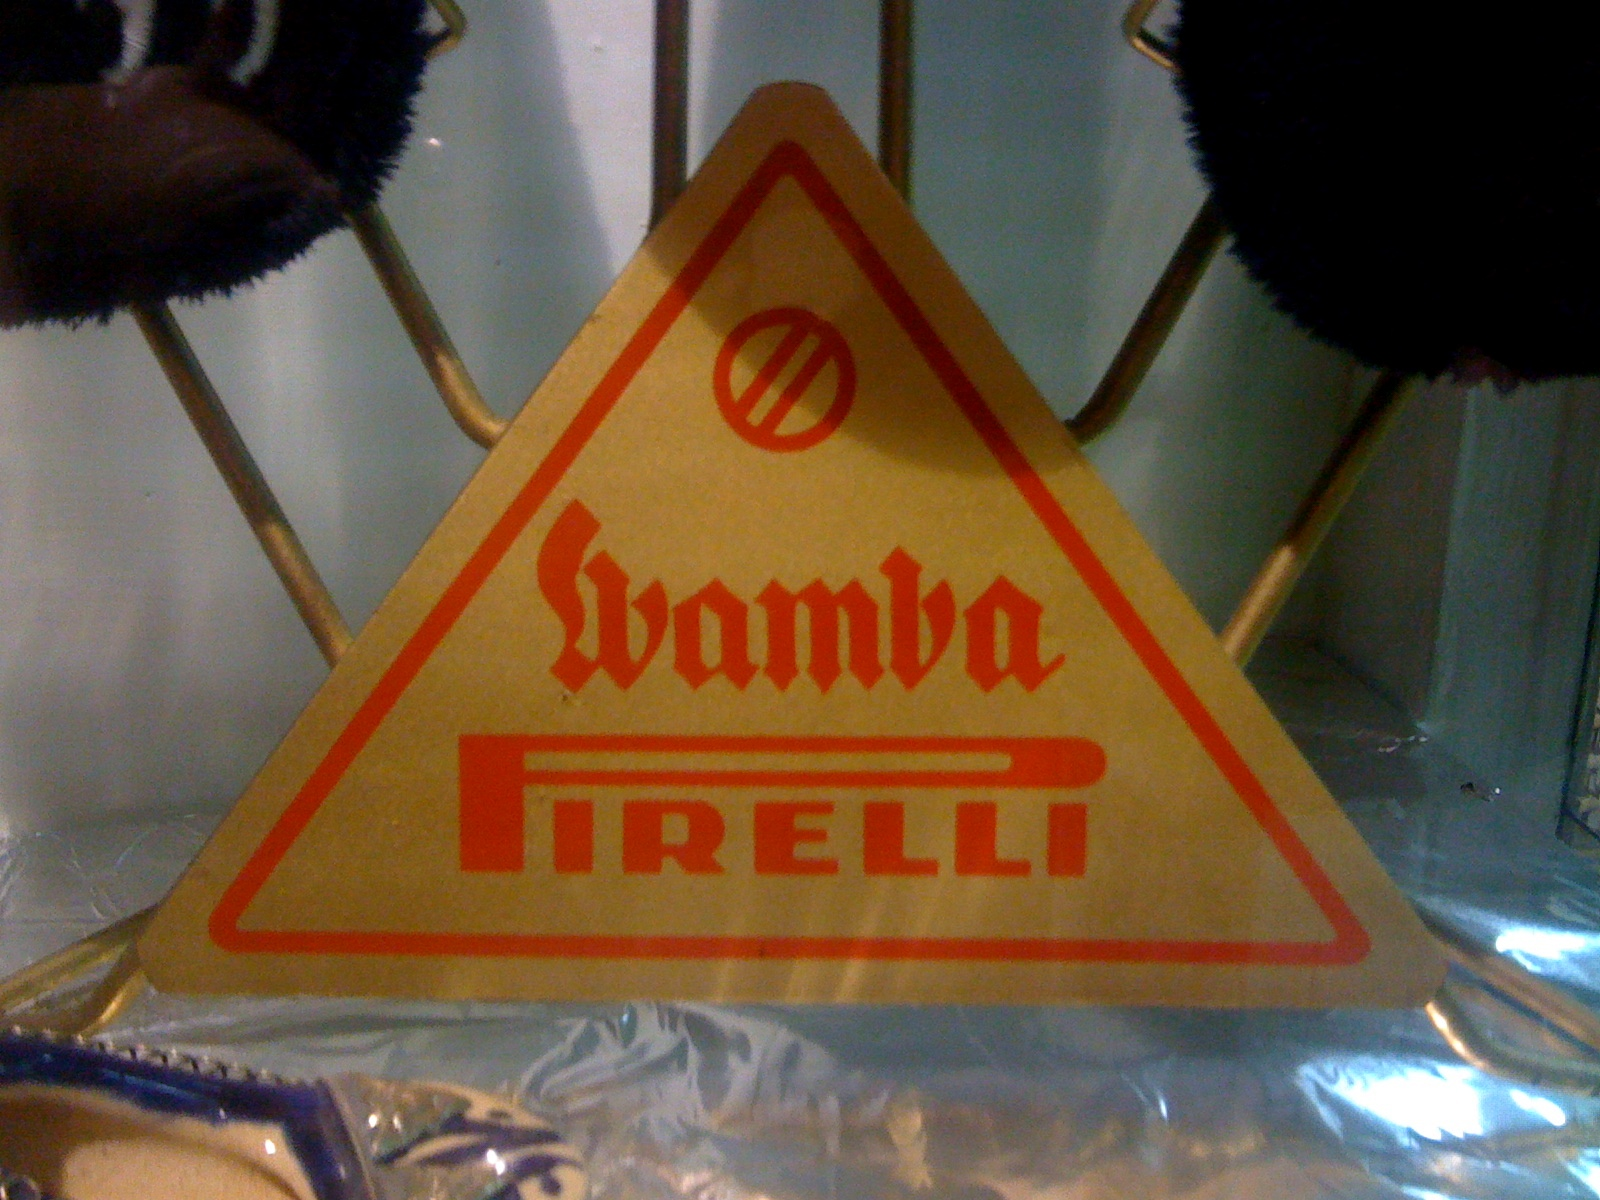 http://3.bp.blogspot.com/-_K19839admM/TyrzJVx_yII/AAAAAAAADOk/yqfRycemRz4/s1600/pirelli+wamba+001.jpg